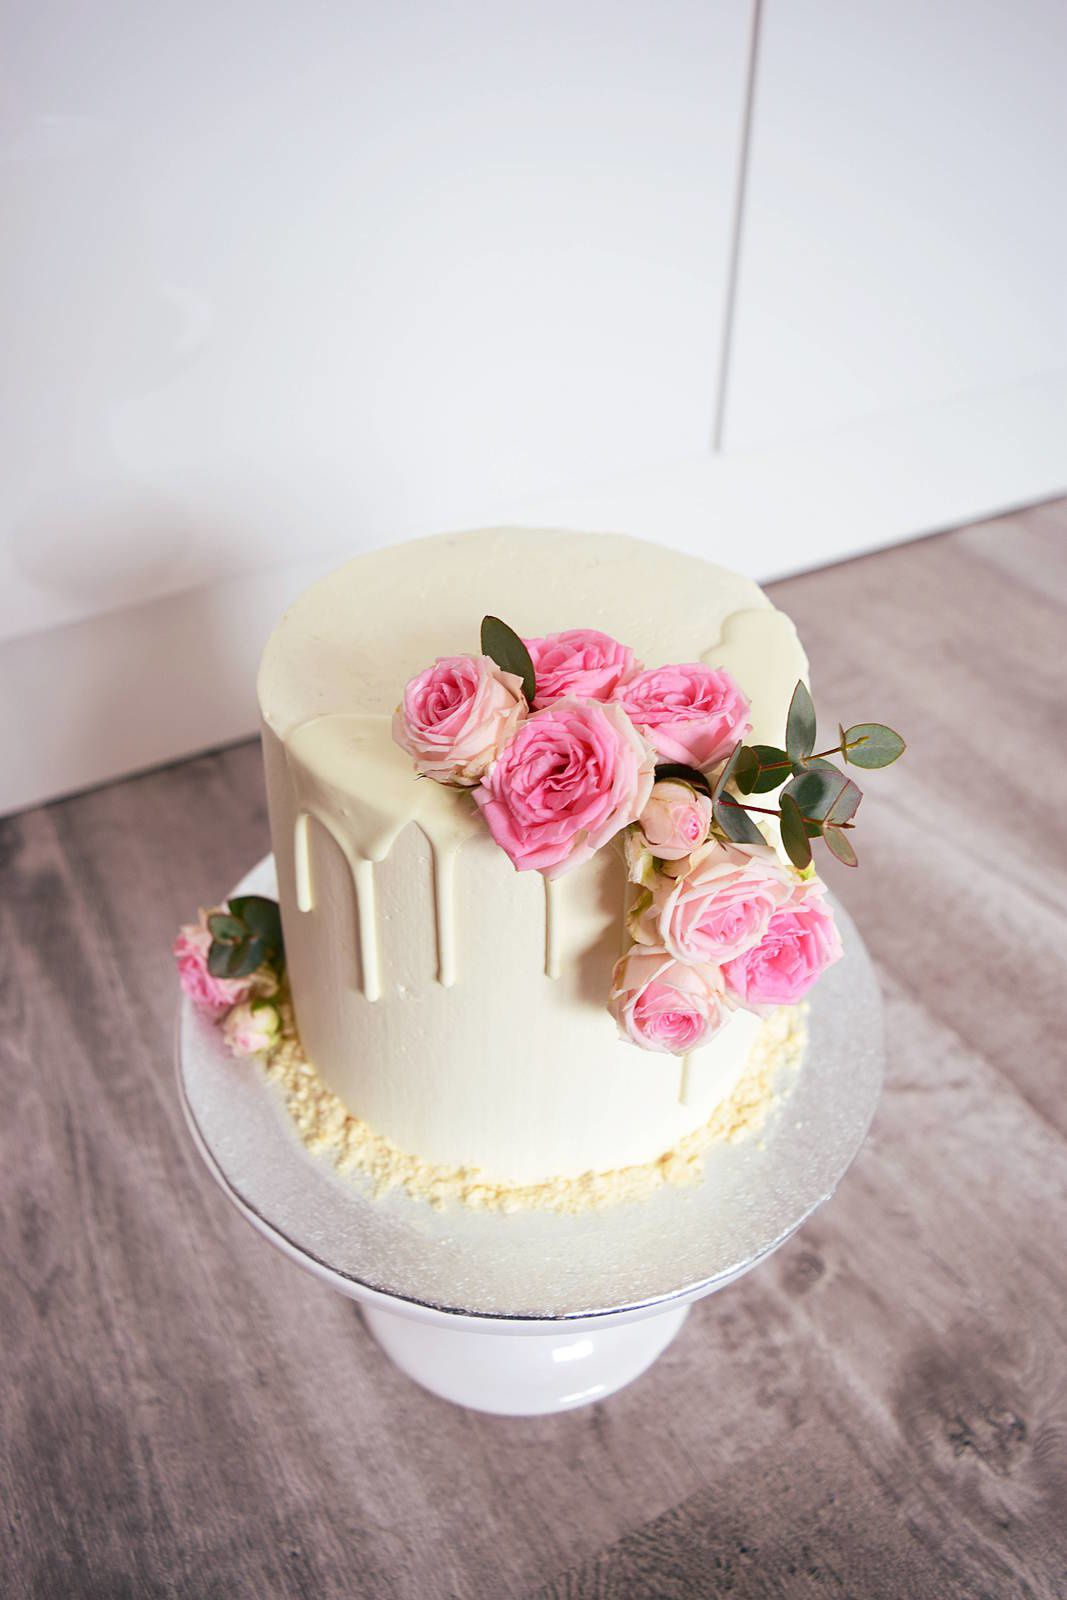 Classy layer cake